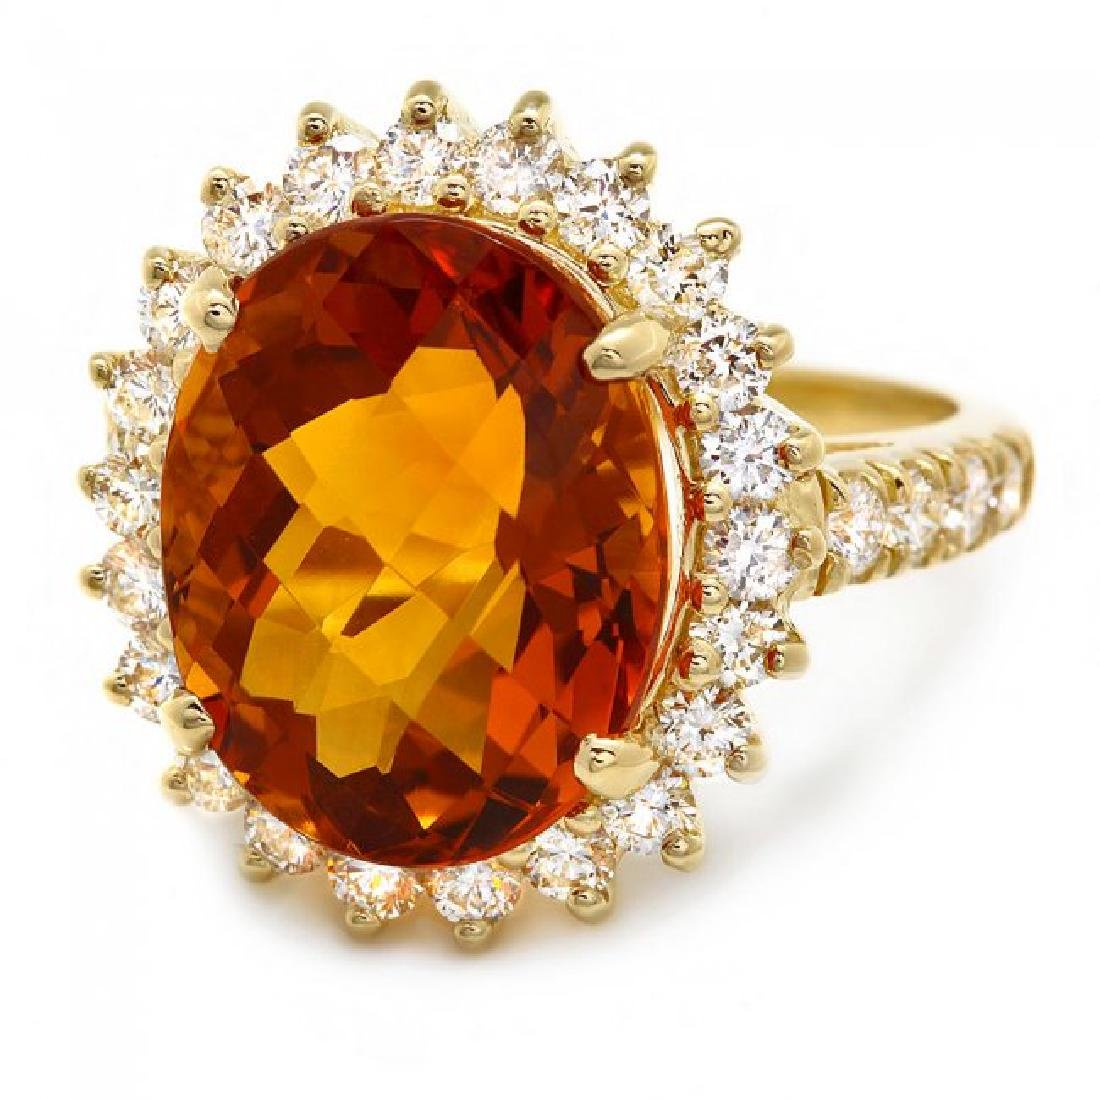 14k Gold 8.00ct Citrine 1.20ct Diamond Ring - 2